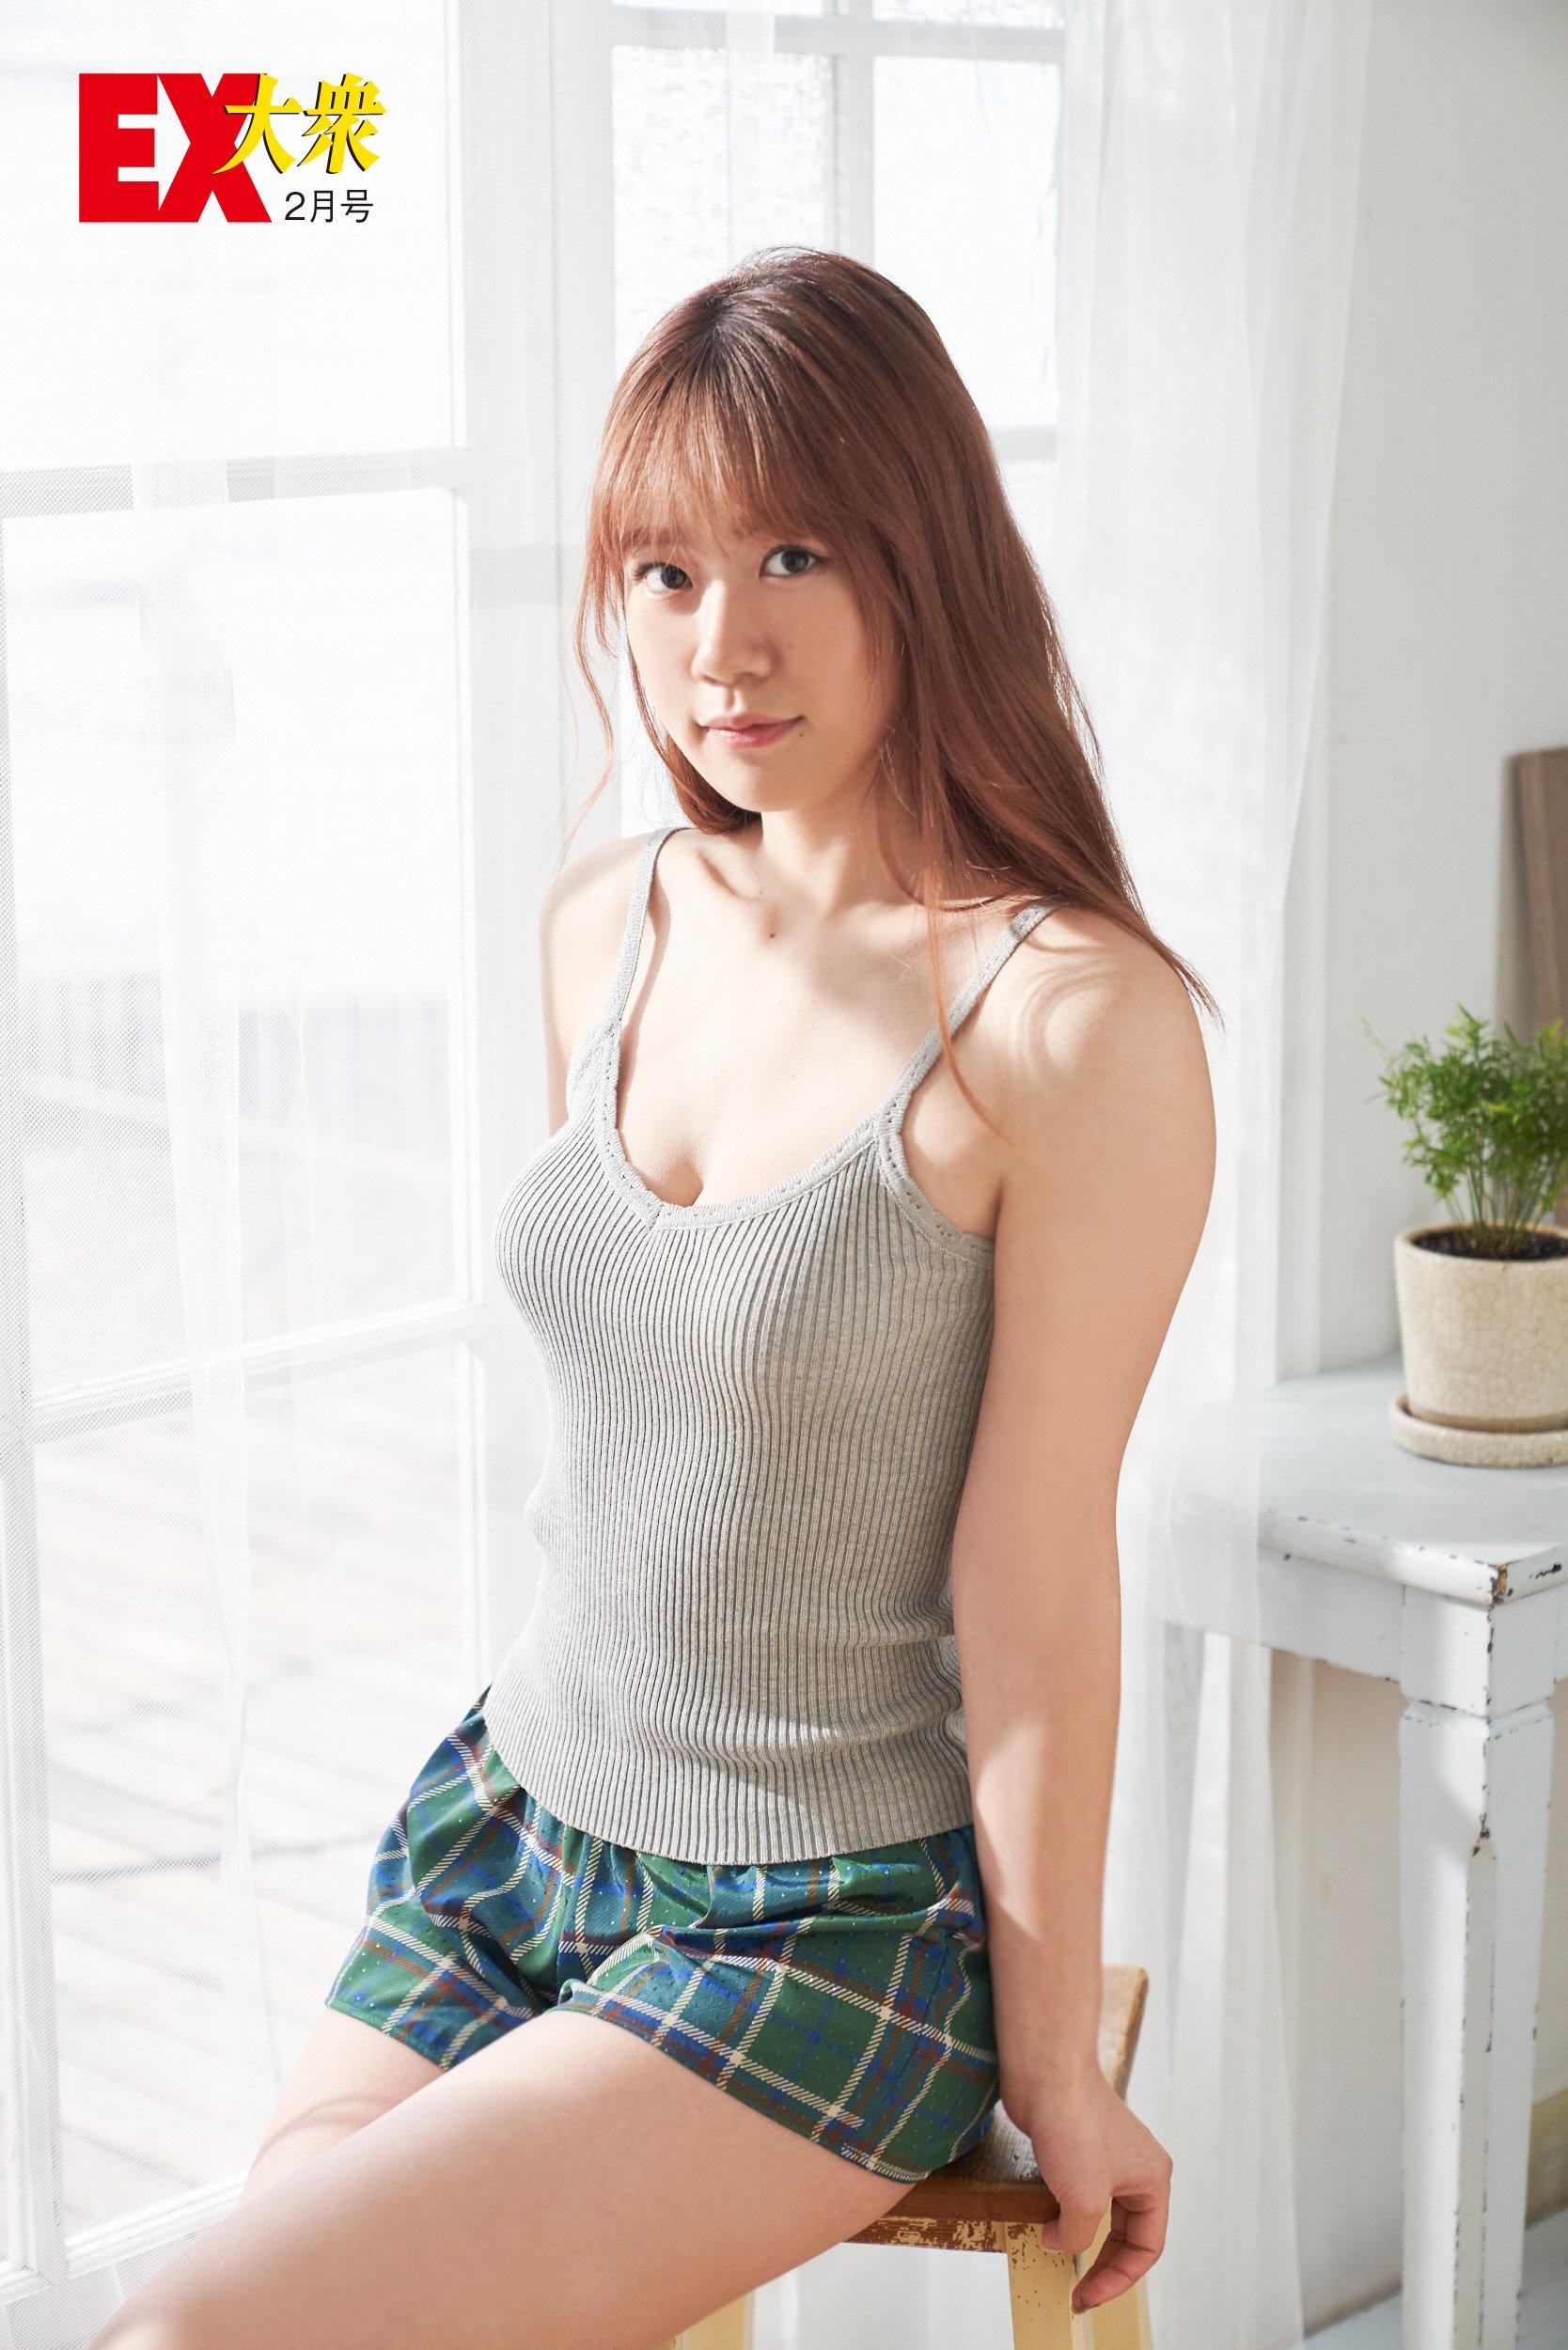 AKB48馬嘉伶、服部有菜、下尾みうの本誌未掲載カット7枚を大公開!【EX大衆2月号】の画像003